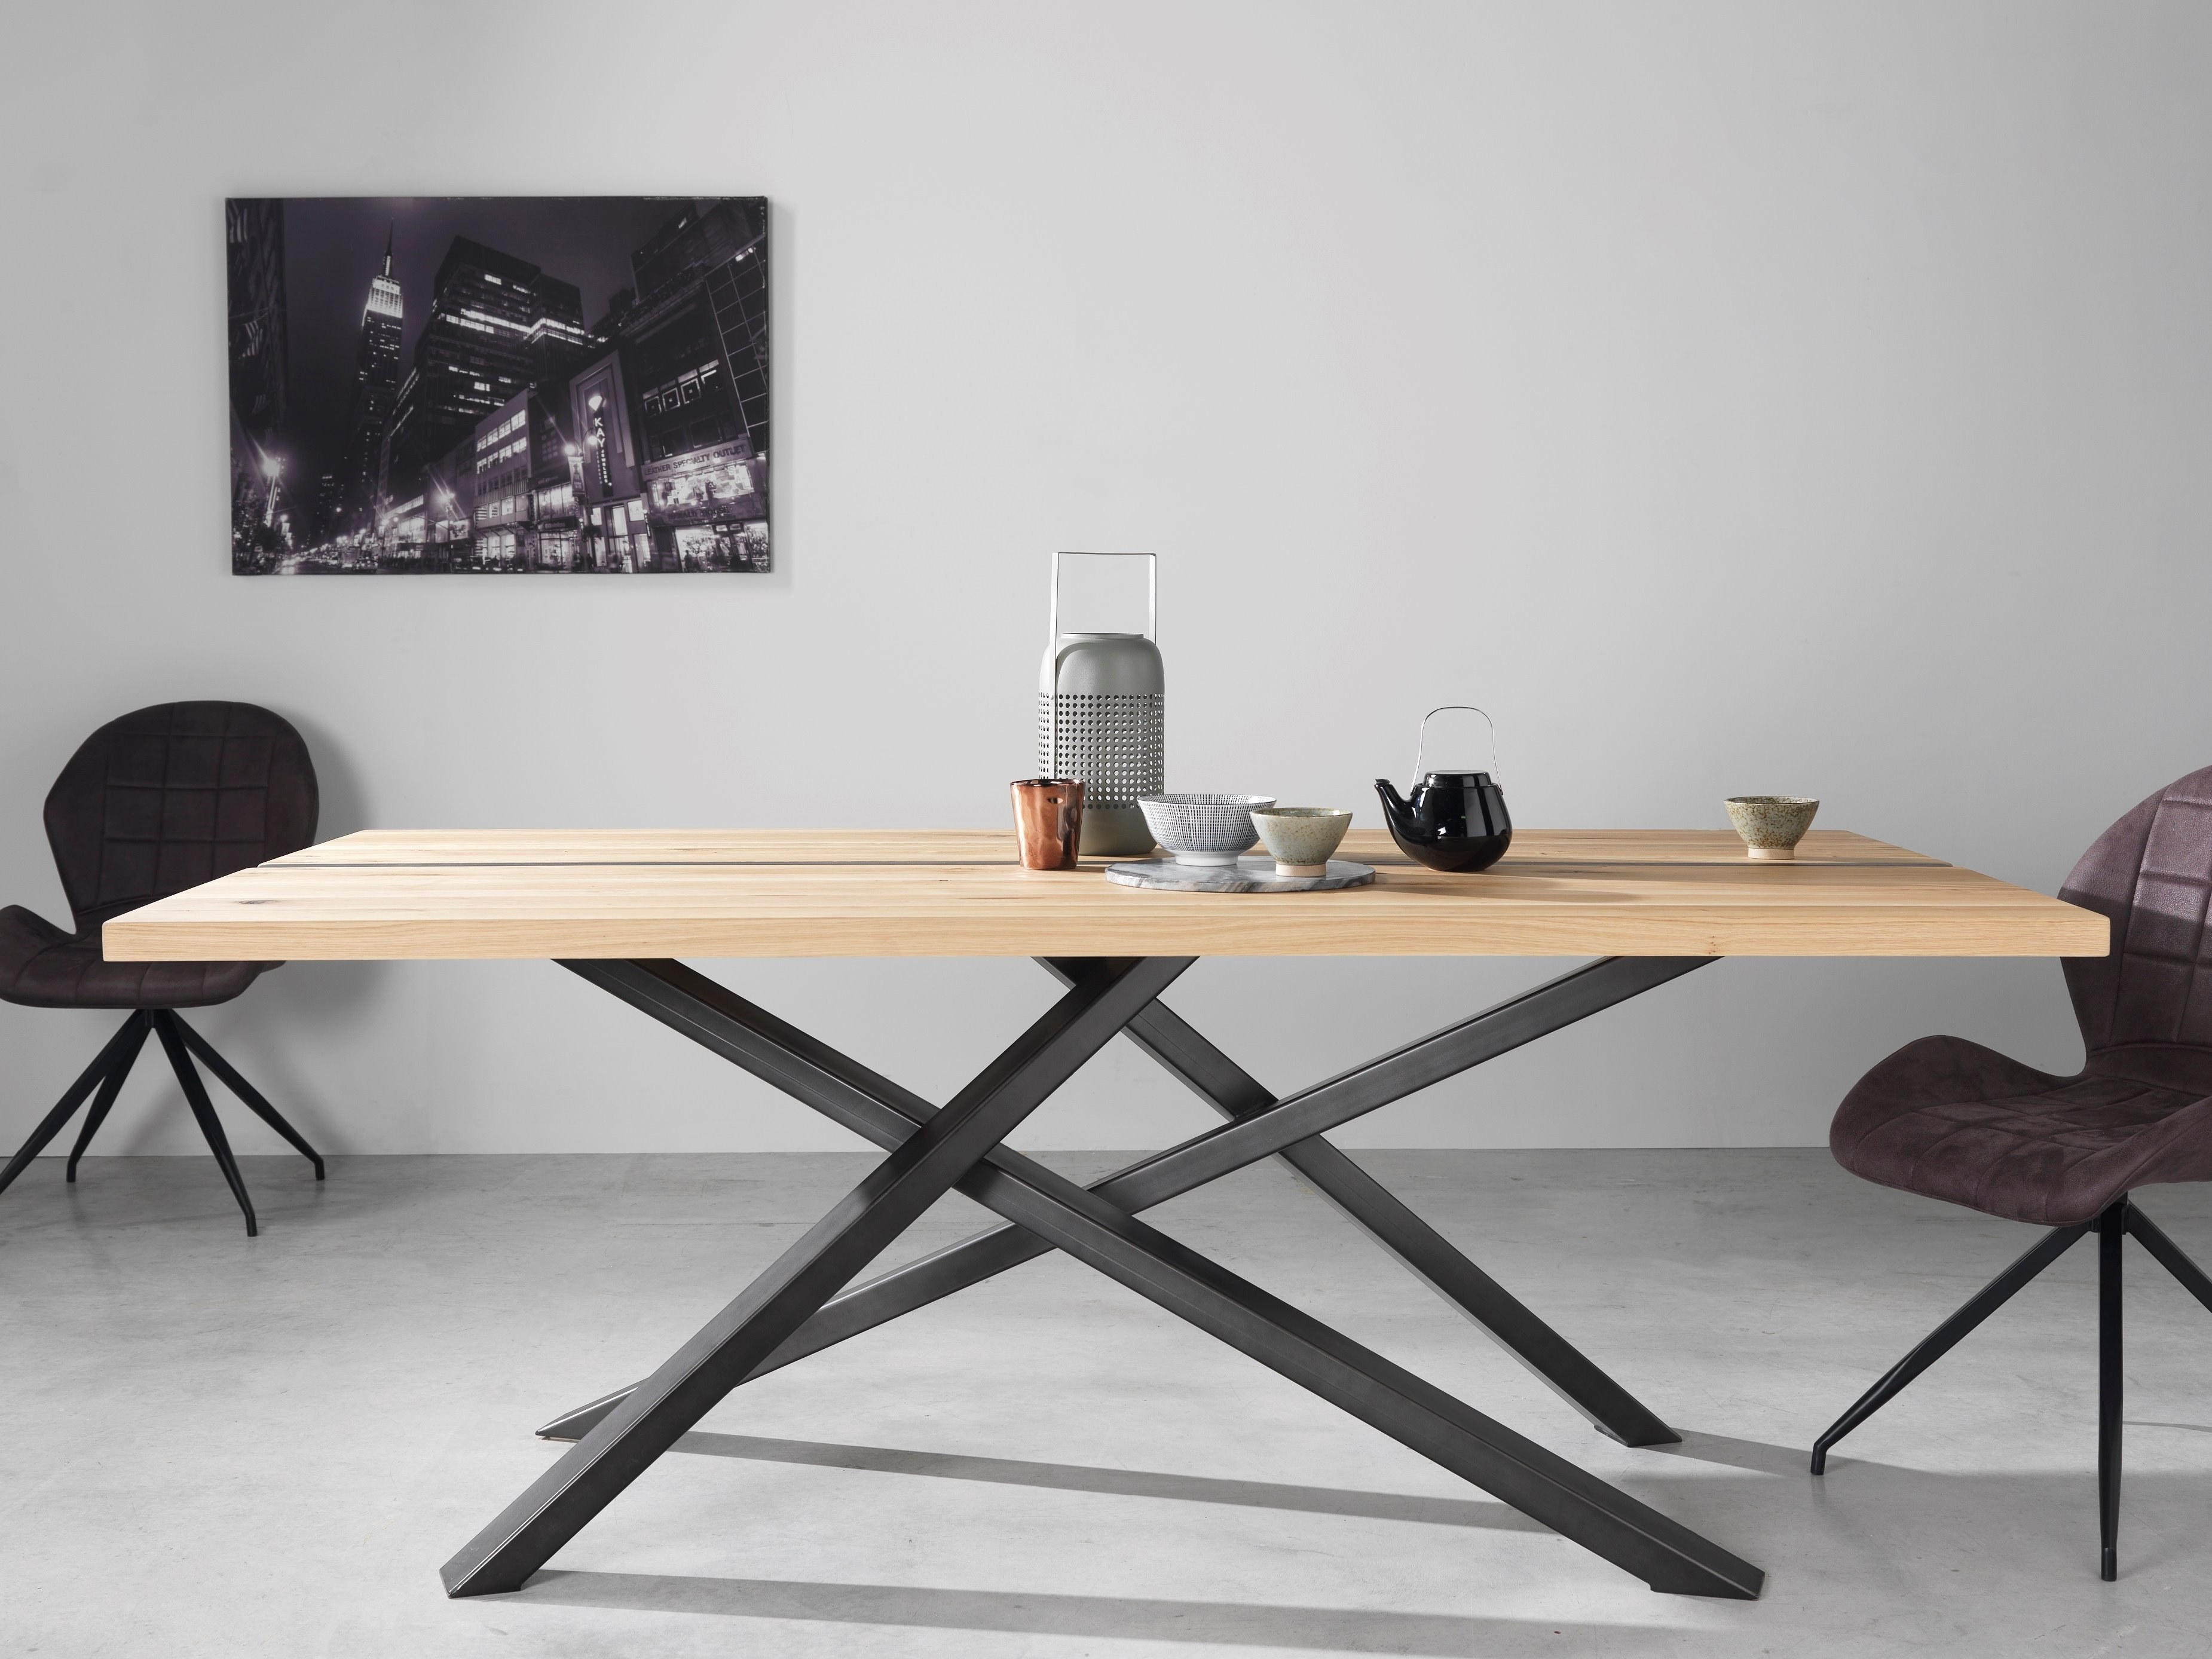 Table pied métal jasmin